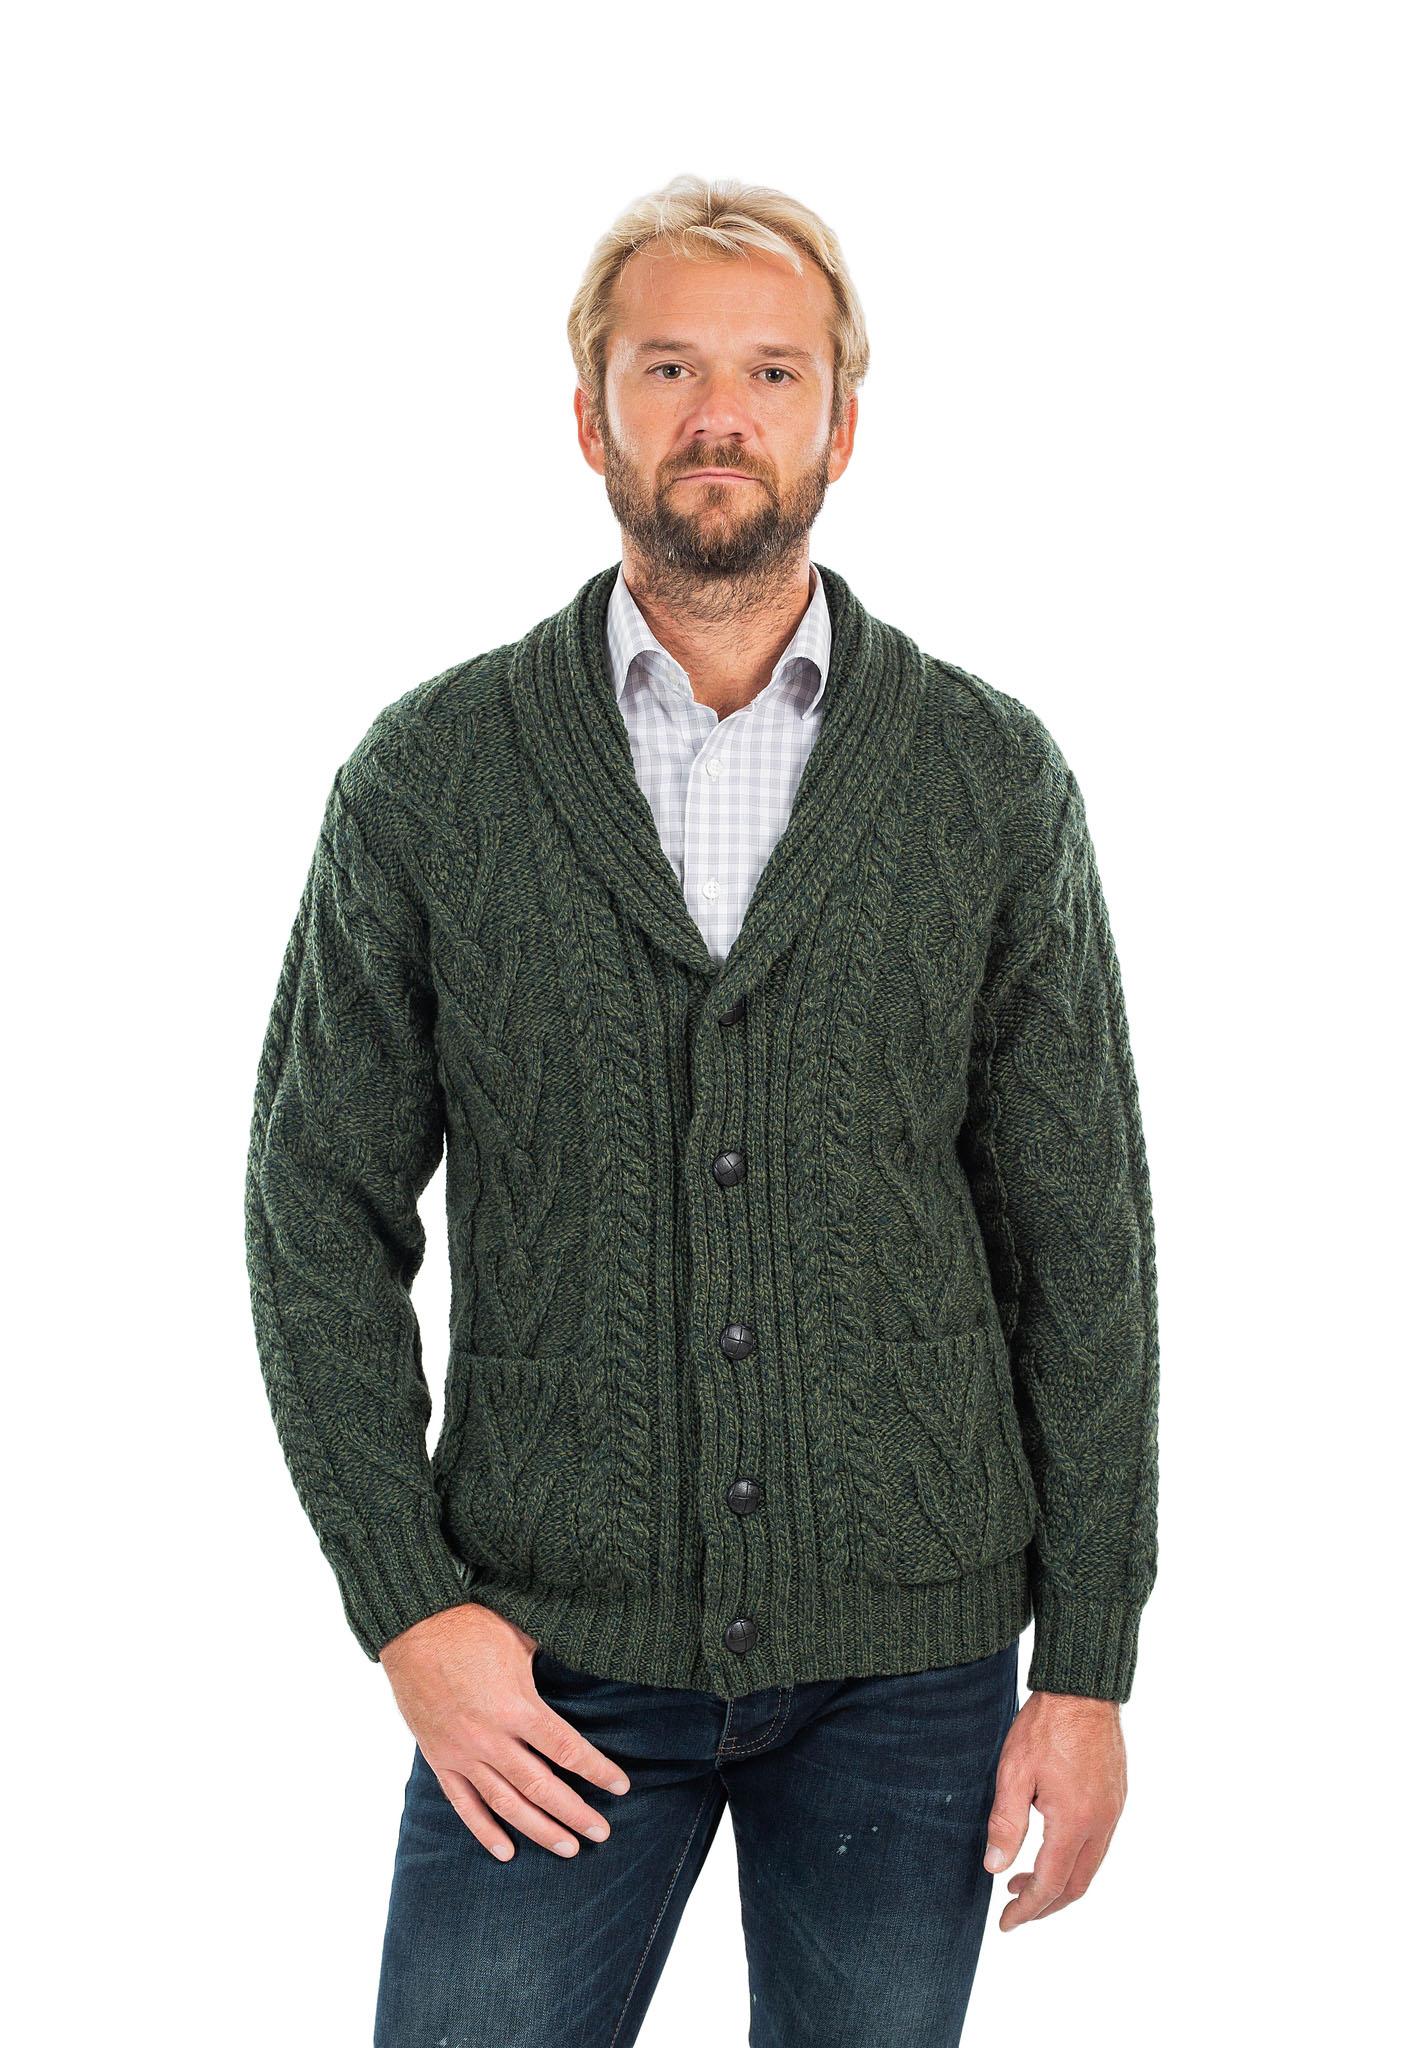 SAOL-Mens-Irish-Merino-Wool-Cardigan-Shawl-Collar-Front-Pockets-Aran-Cable-Knit thumbnail 6